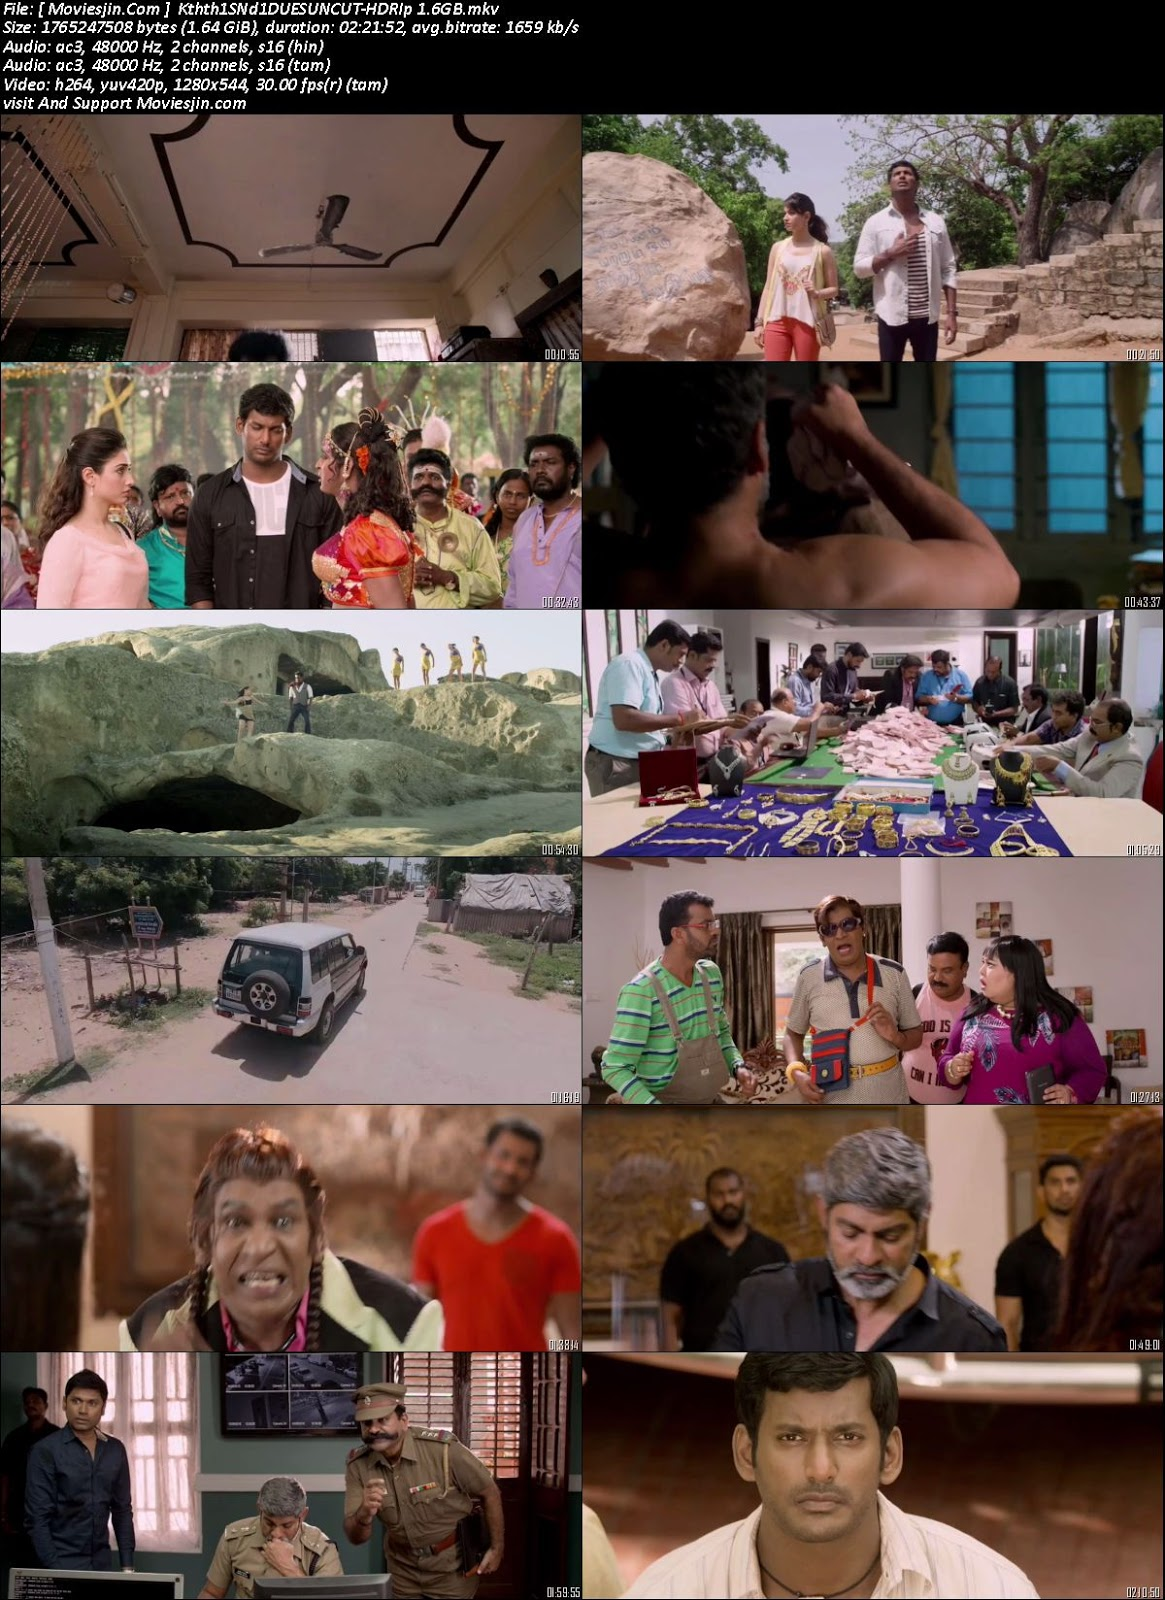 Watch Online Kaththi Sandai 2016 UNCUT Dual Audio Hindi Tamil 720p Full Movie Download Khatrimaza, free download 9xmovies,